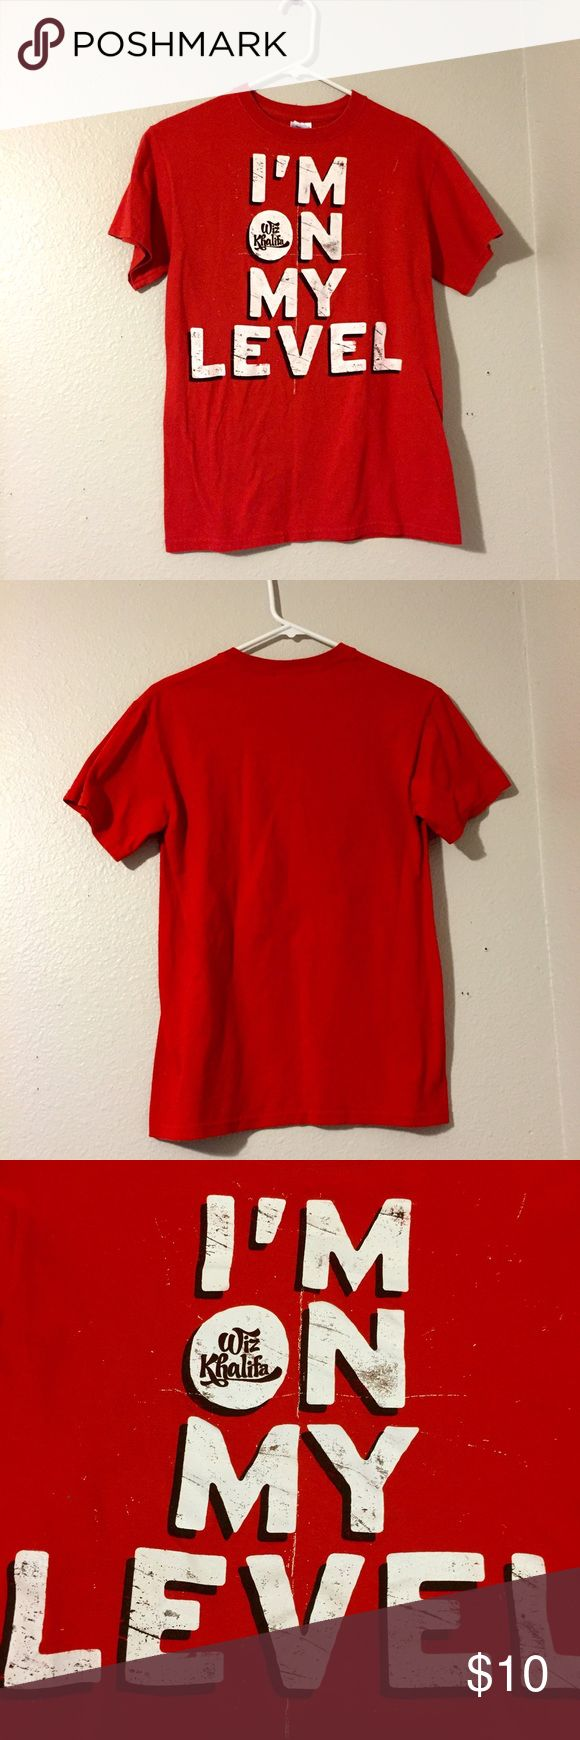 T-shirt design zeixs - Hot Topic Wiz Khalifa T Shirt